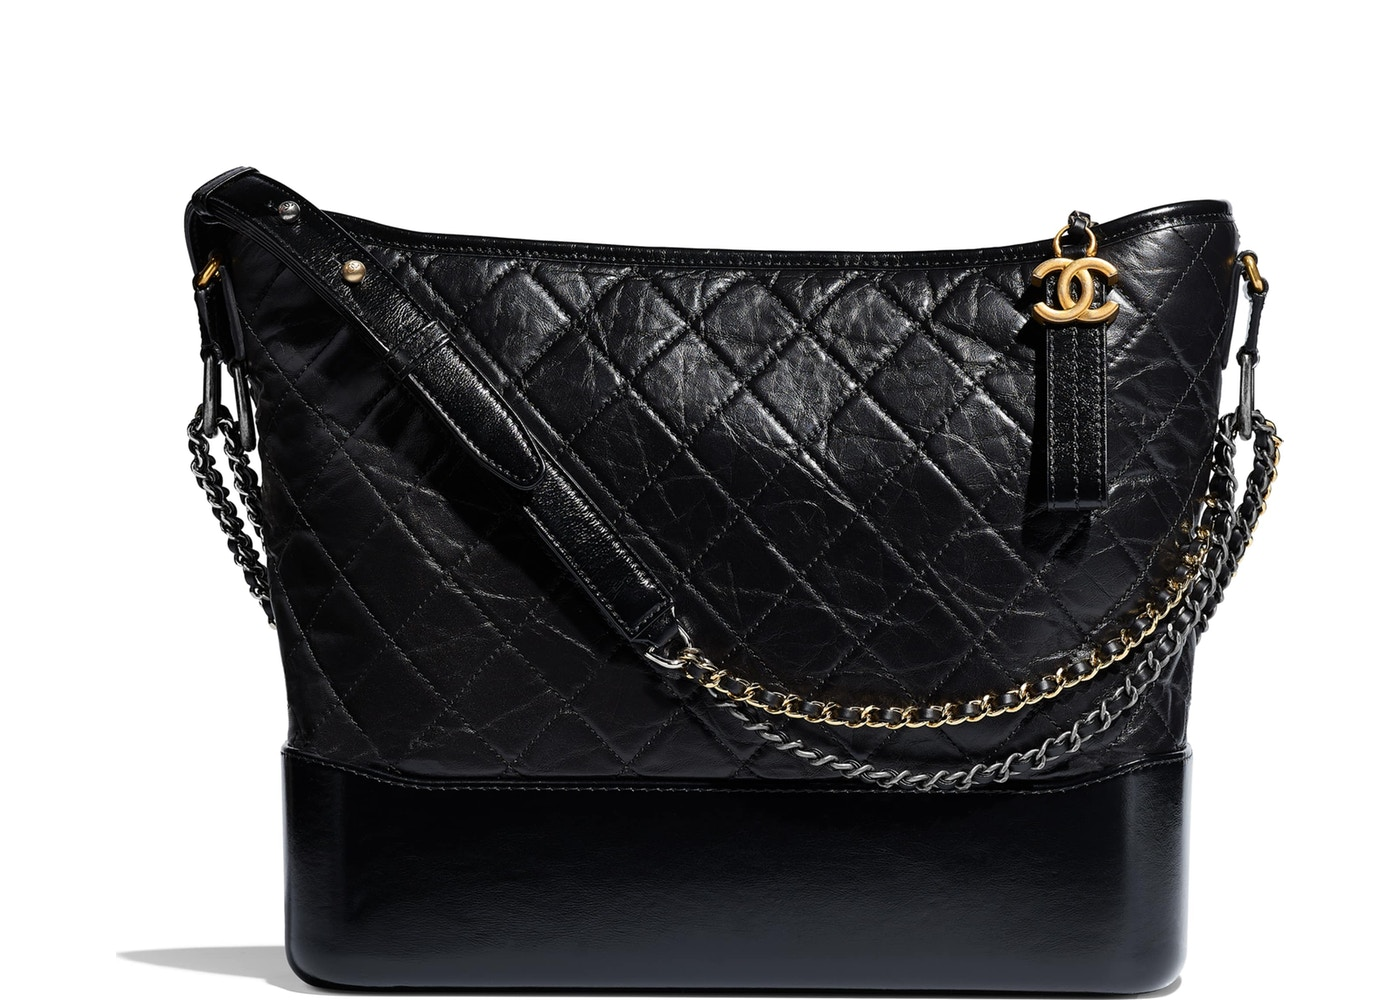 b5b747bb079a Large Chanel Bag 2018 – Hanna Oaks